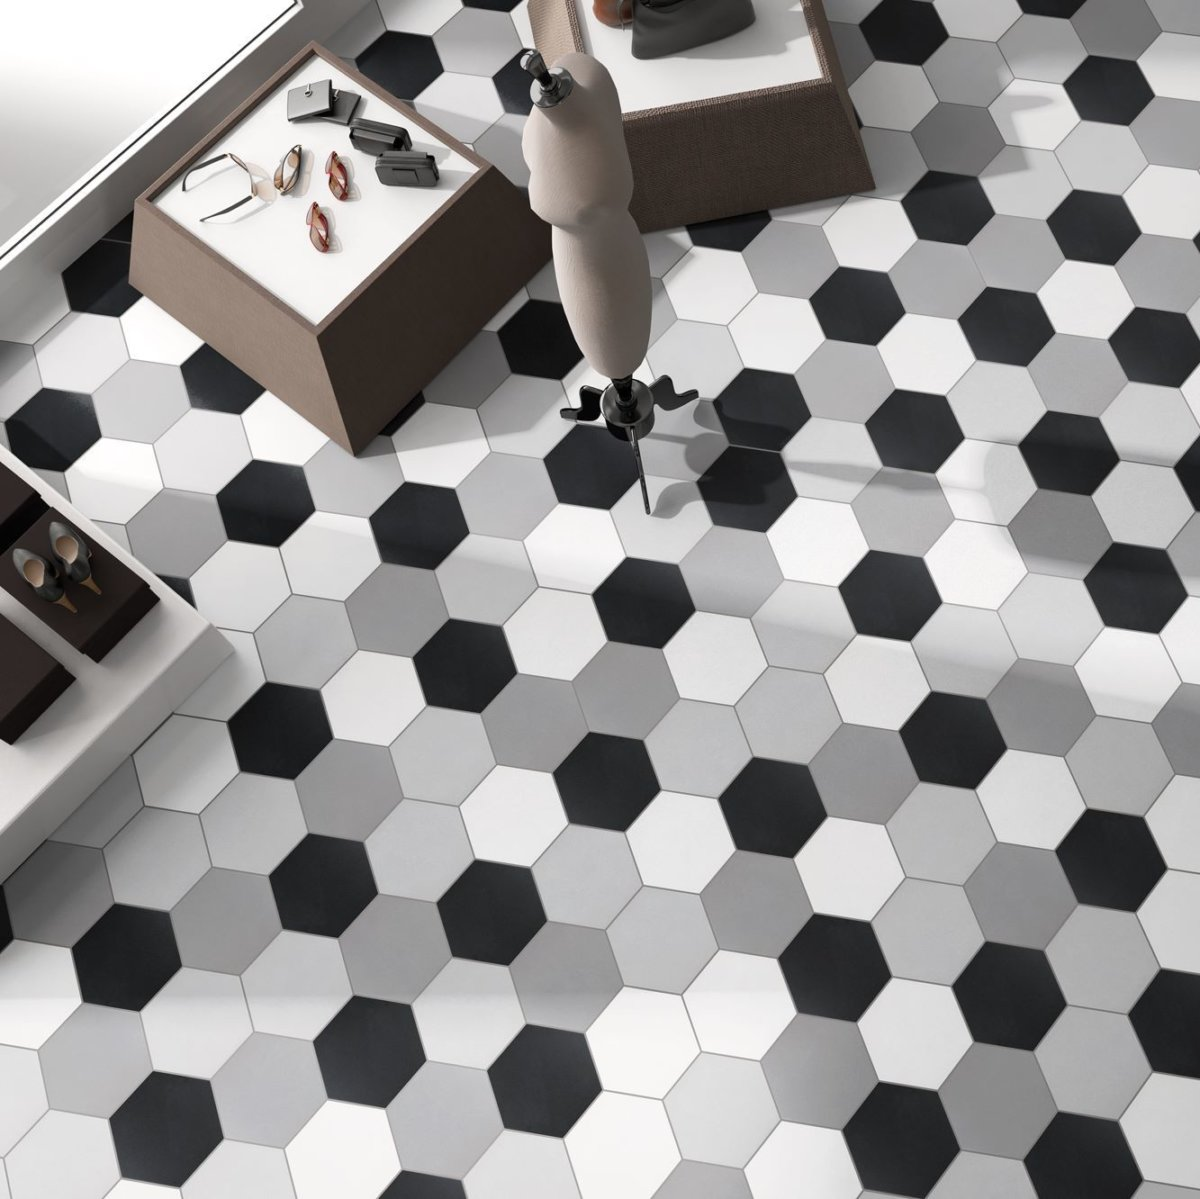 Codicer Hexagon Basic Black Porcelain 220x250mm_Stiles_Lifestyle_Image